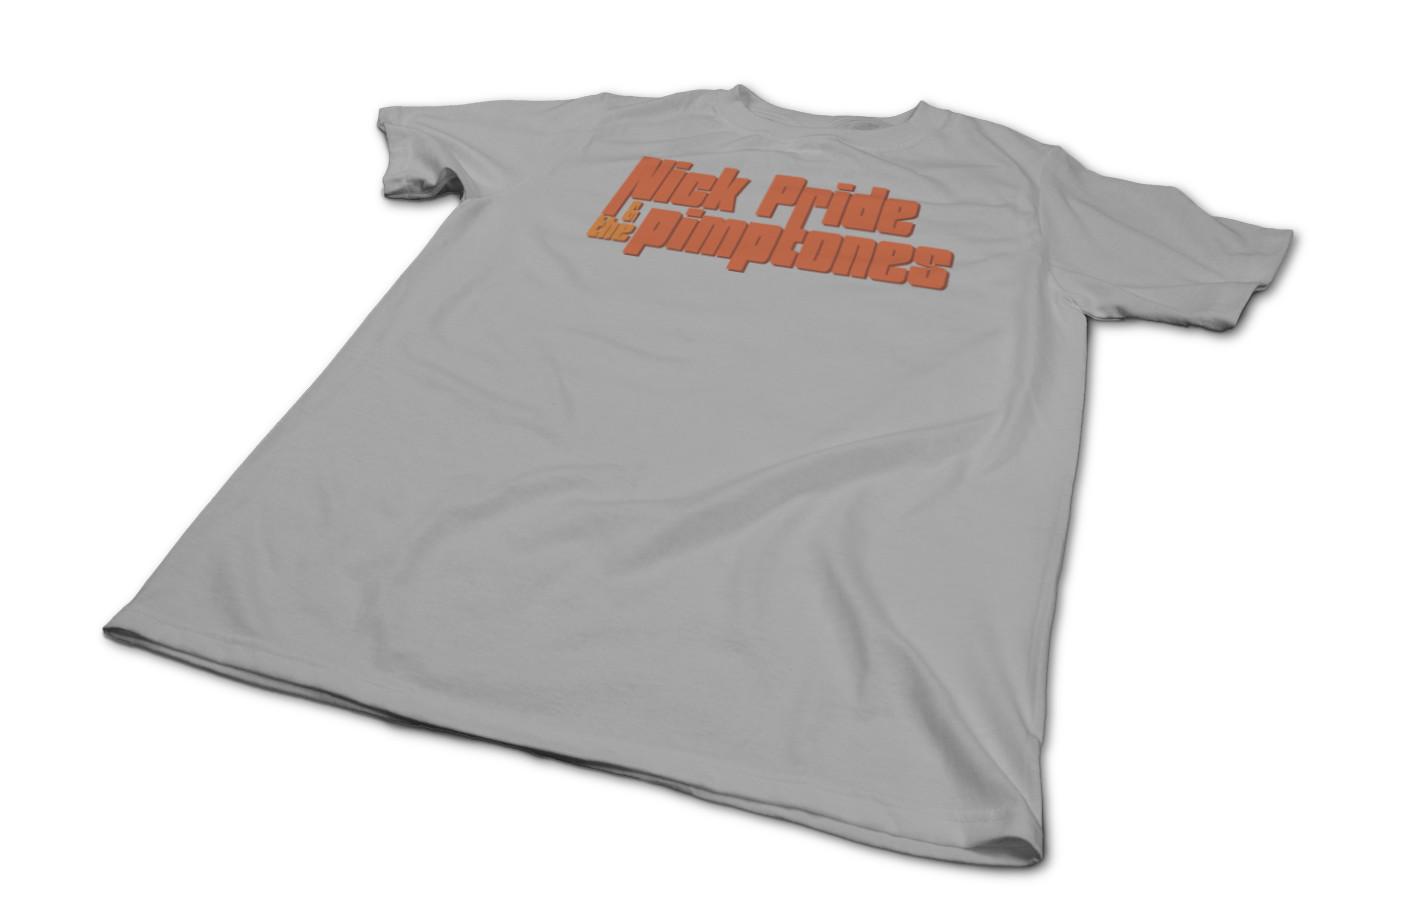 Nick pride and the pimptones   logo t shirt 01 uyq0mm